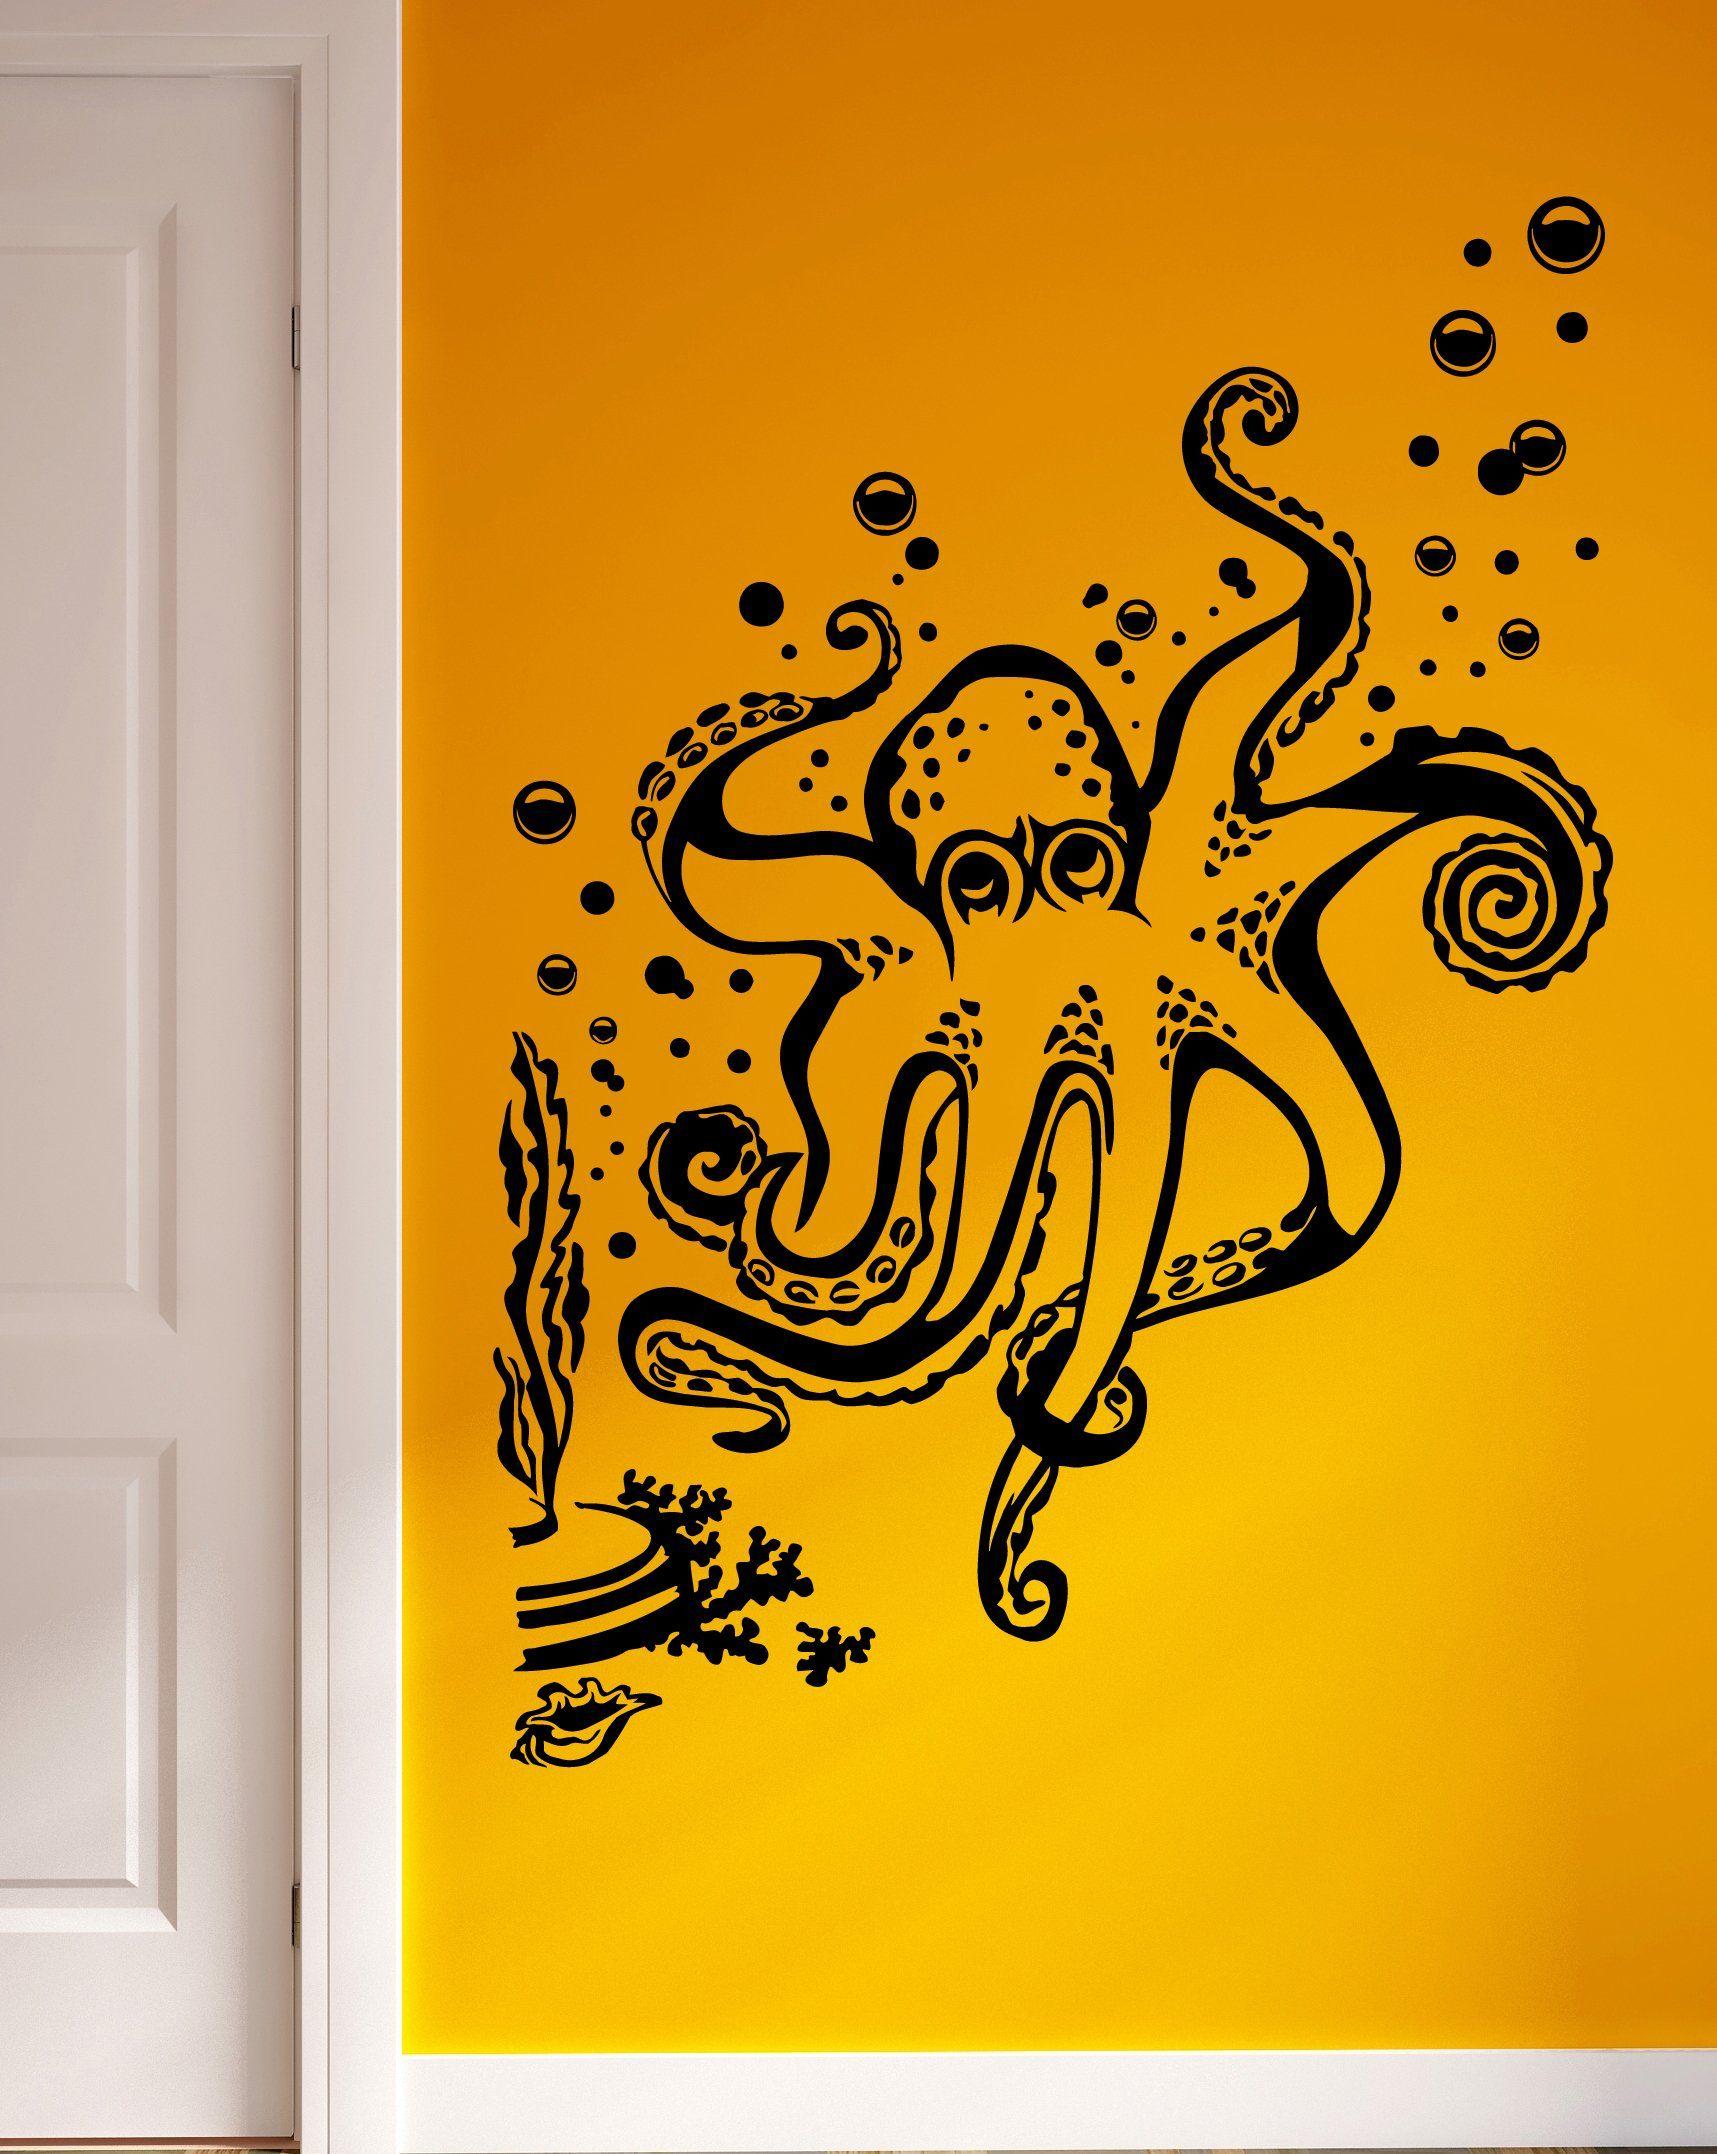 Amazon.com - Octopus Seaweed Bubbles Ocean Marine Sea Decor Wall Mural Vinyl Art Decal Sticker M490 -